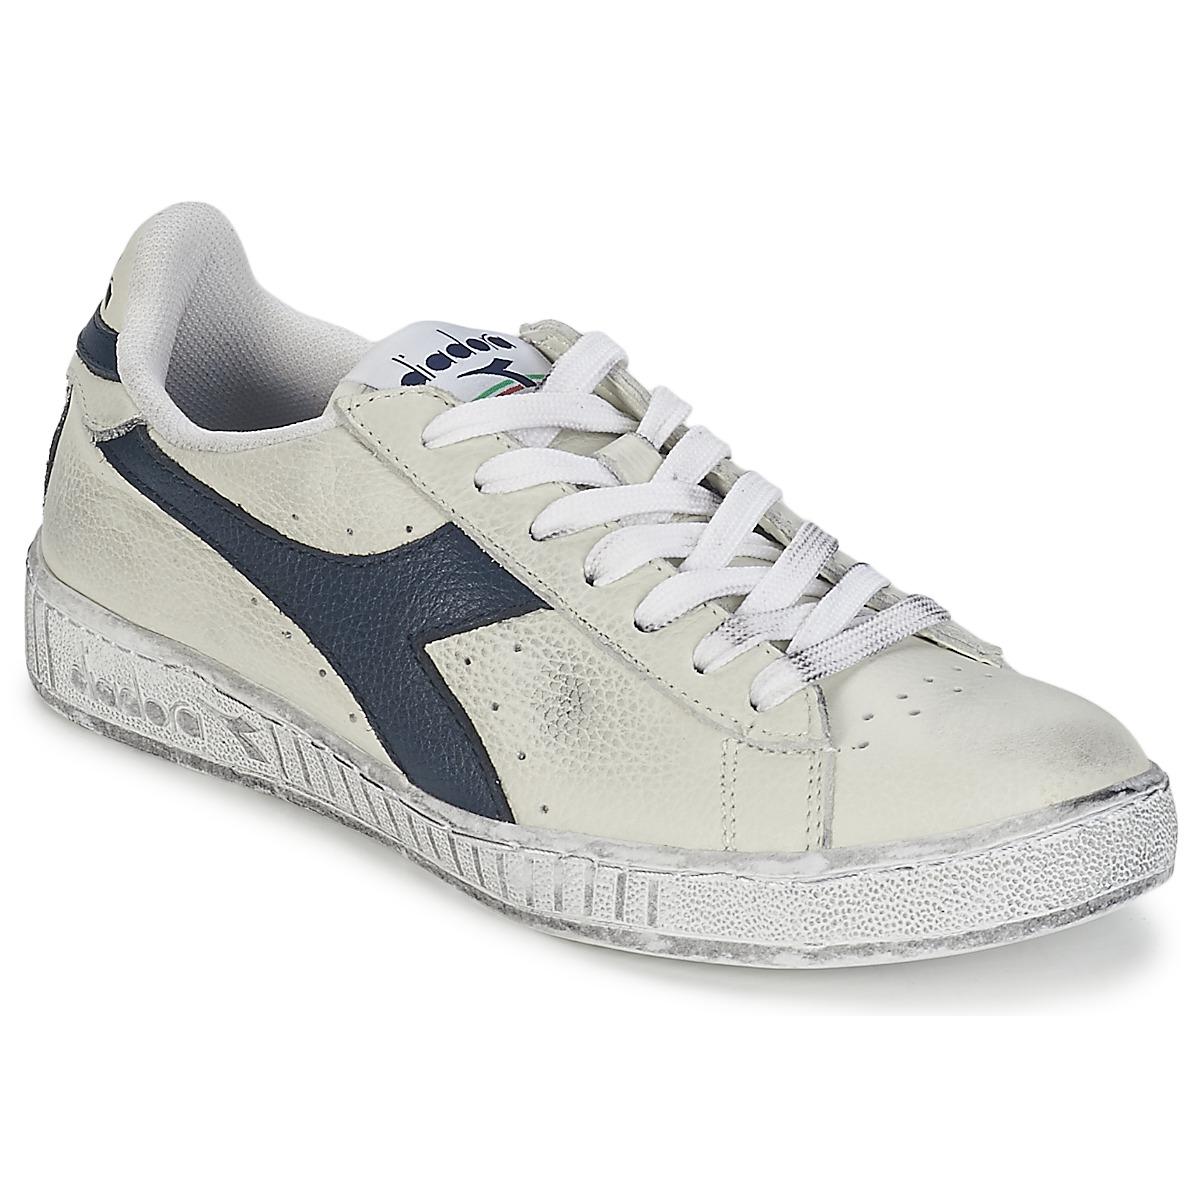 Sneakers basse Diadora GAME L LOW WAXED Bianco / Blu - Consegna